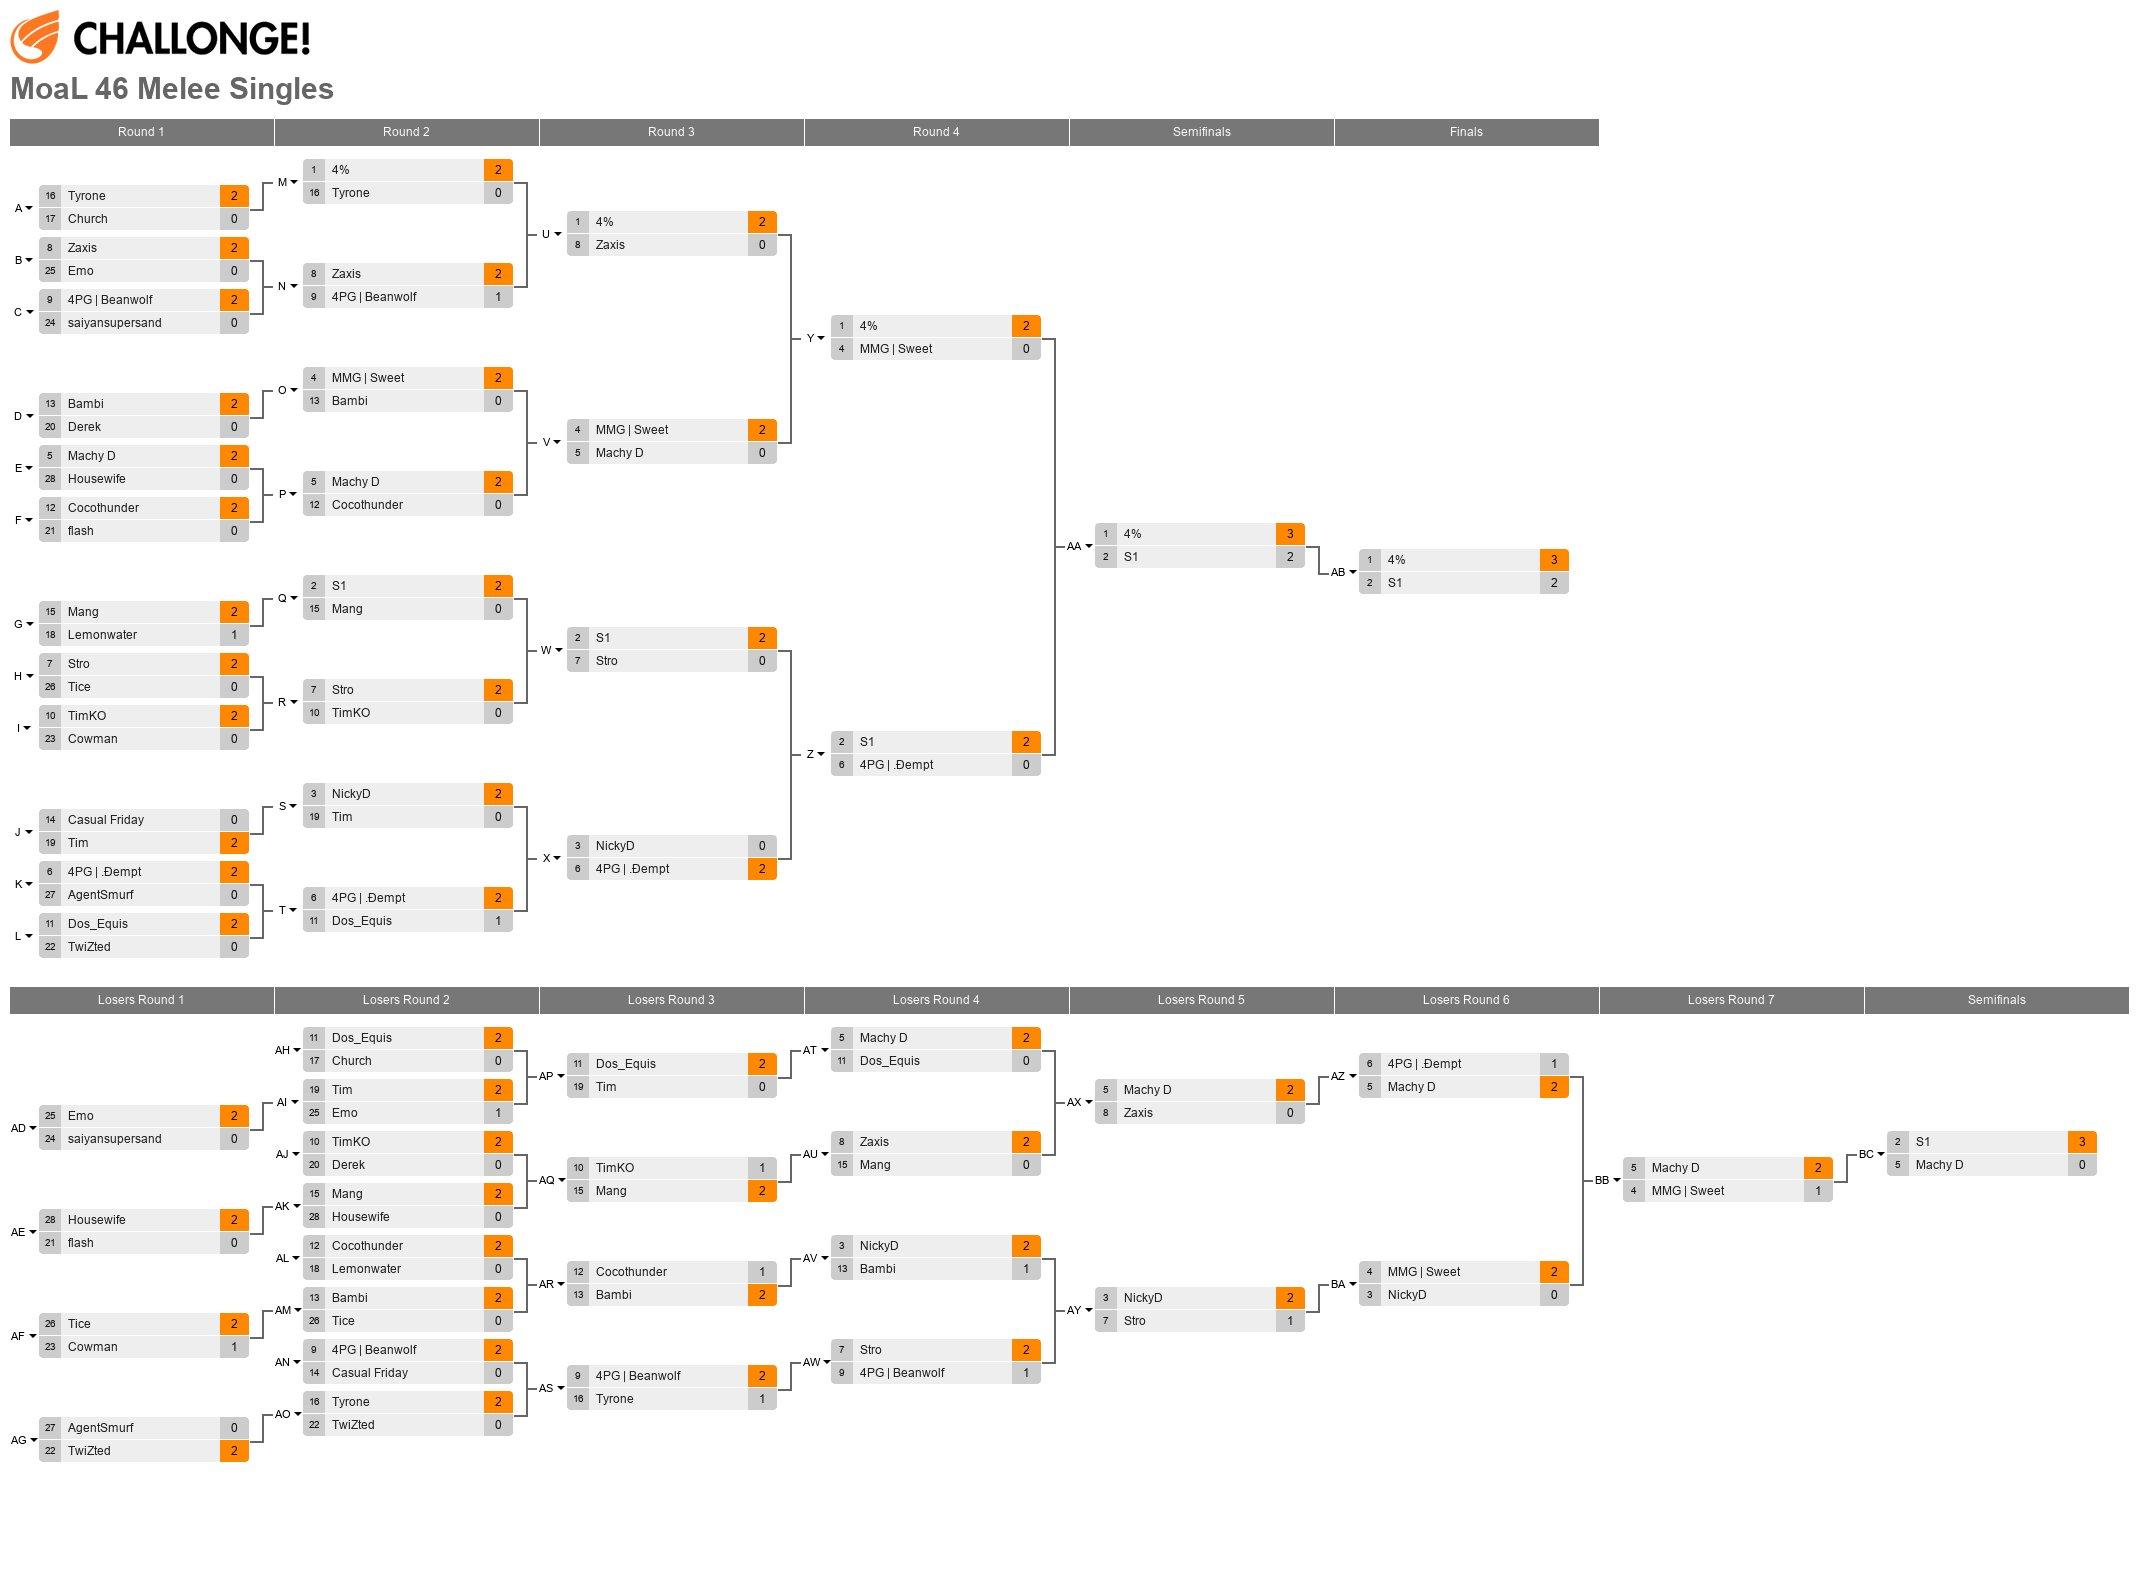 MoaL 46 Melee Singles (03.20.15)